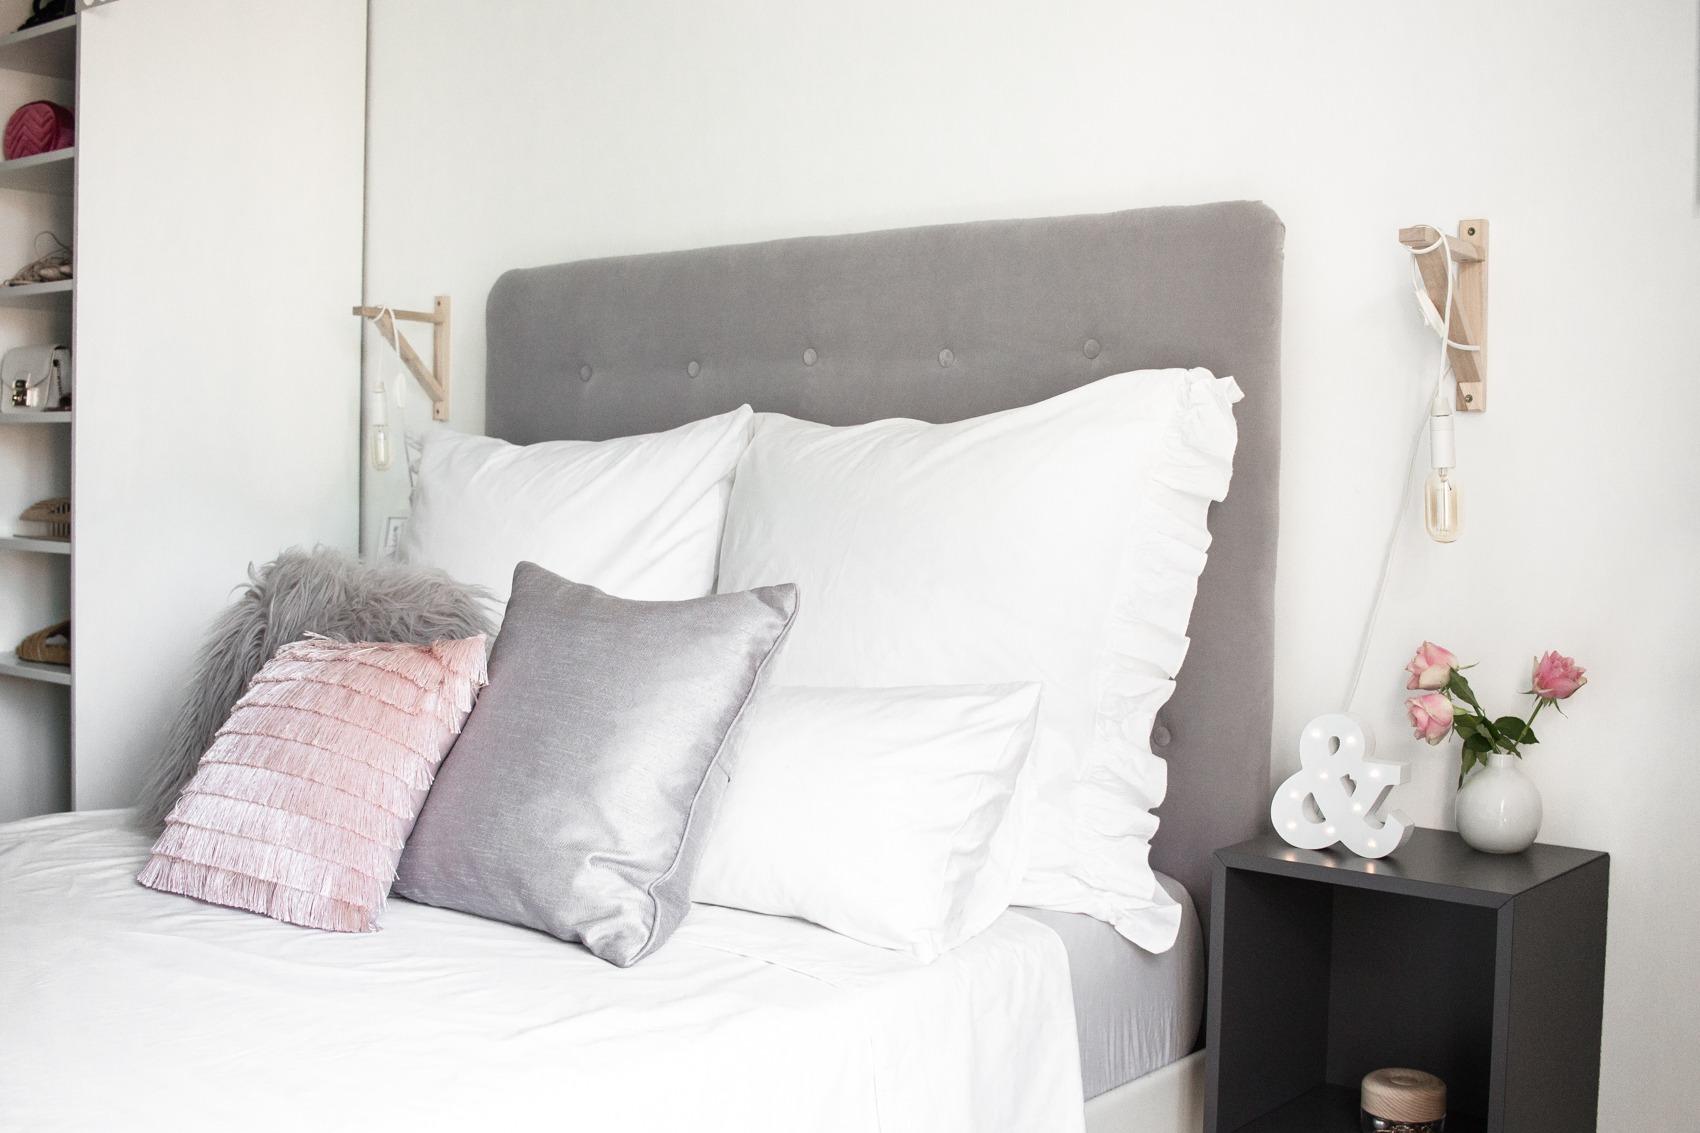 Diy Kopfteil Bett Selfmade Grau Samt Chesterfield Look 21 Puppenzirkus